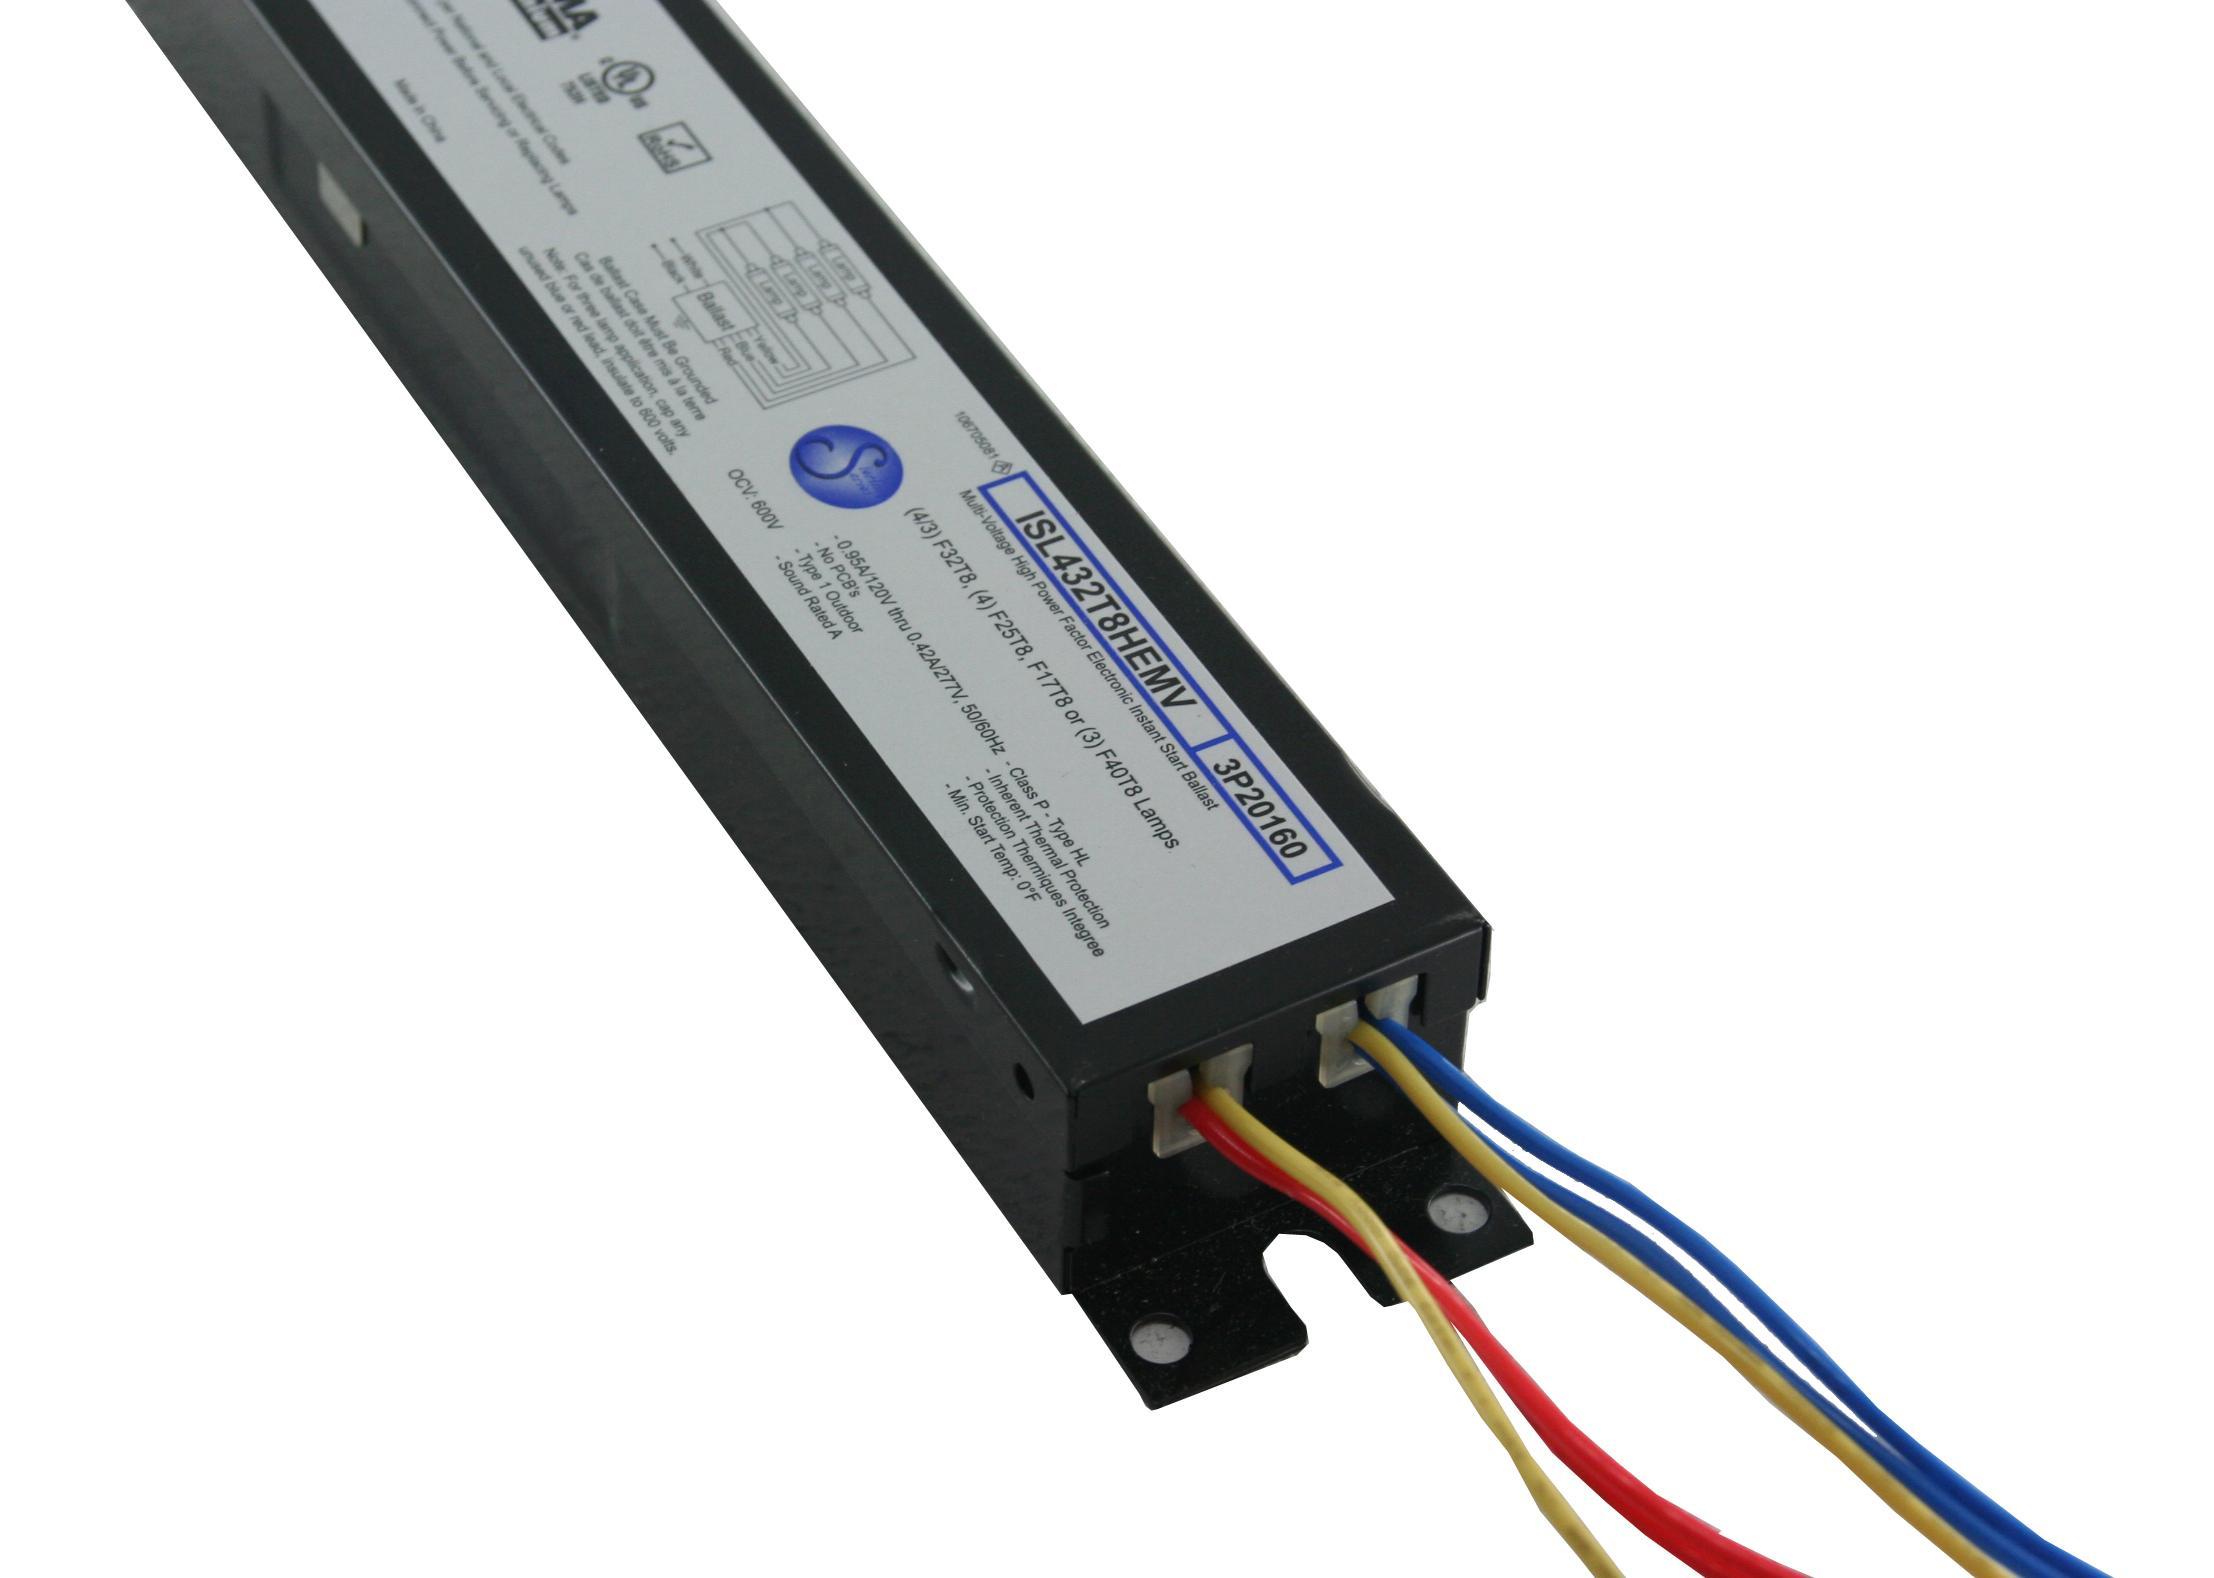 Robertson Worldwide Isl432t8hemv Ah 3p20160 120 277 Vac 50 60 Hz Wiring Diagram For A 3 Lamp Ballast End User Benefits